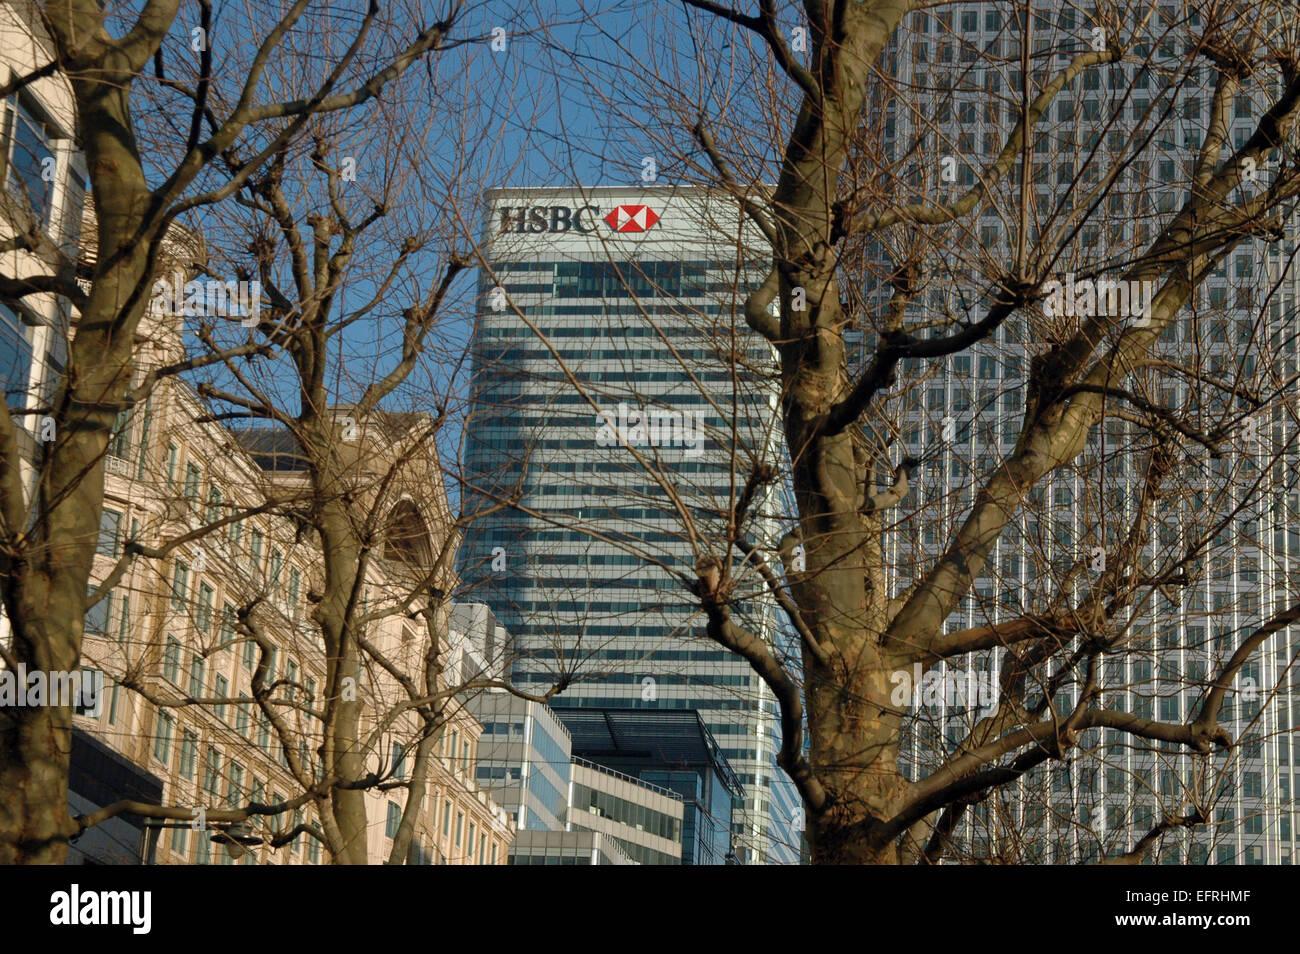 London, UK, 9 February 2015, HSBC head office in Canary Wharf Stock